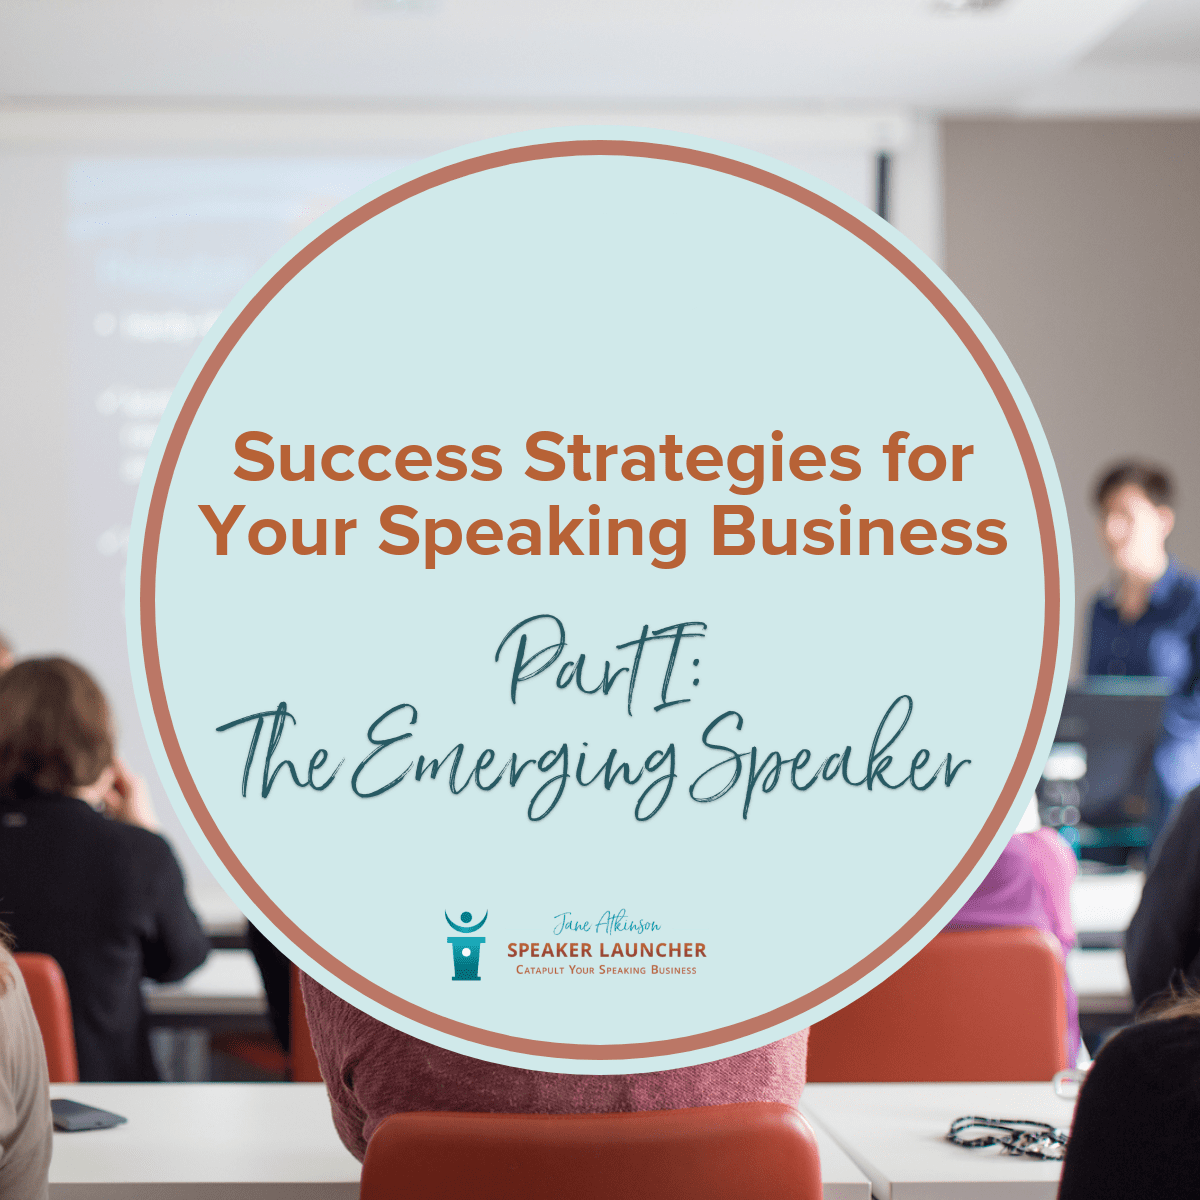 success strategies for your speaking business - emerging speaker